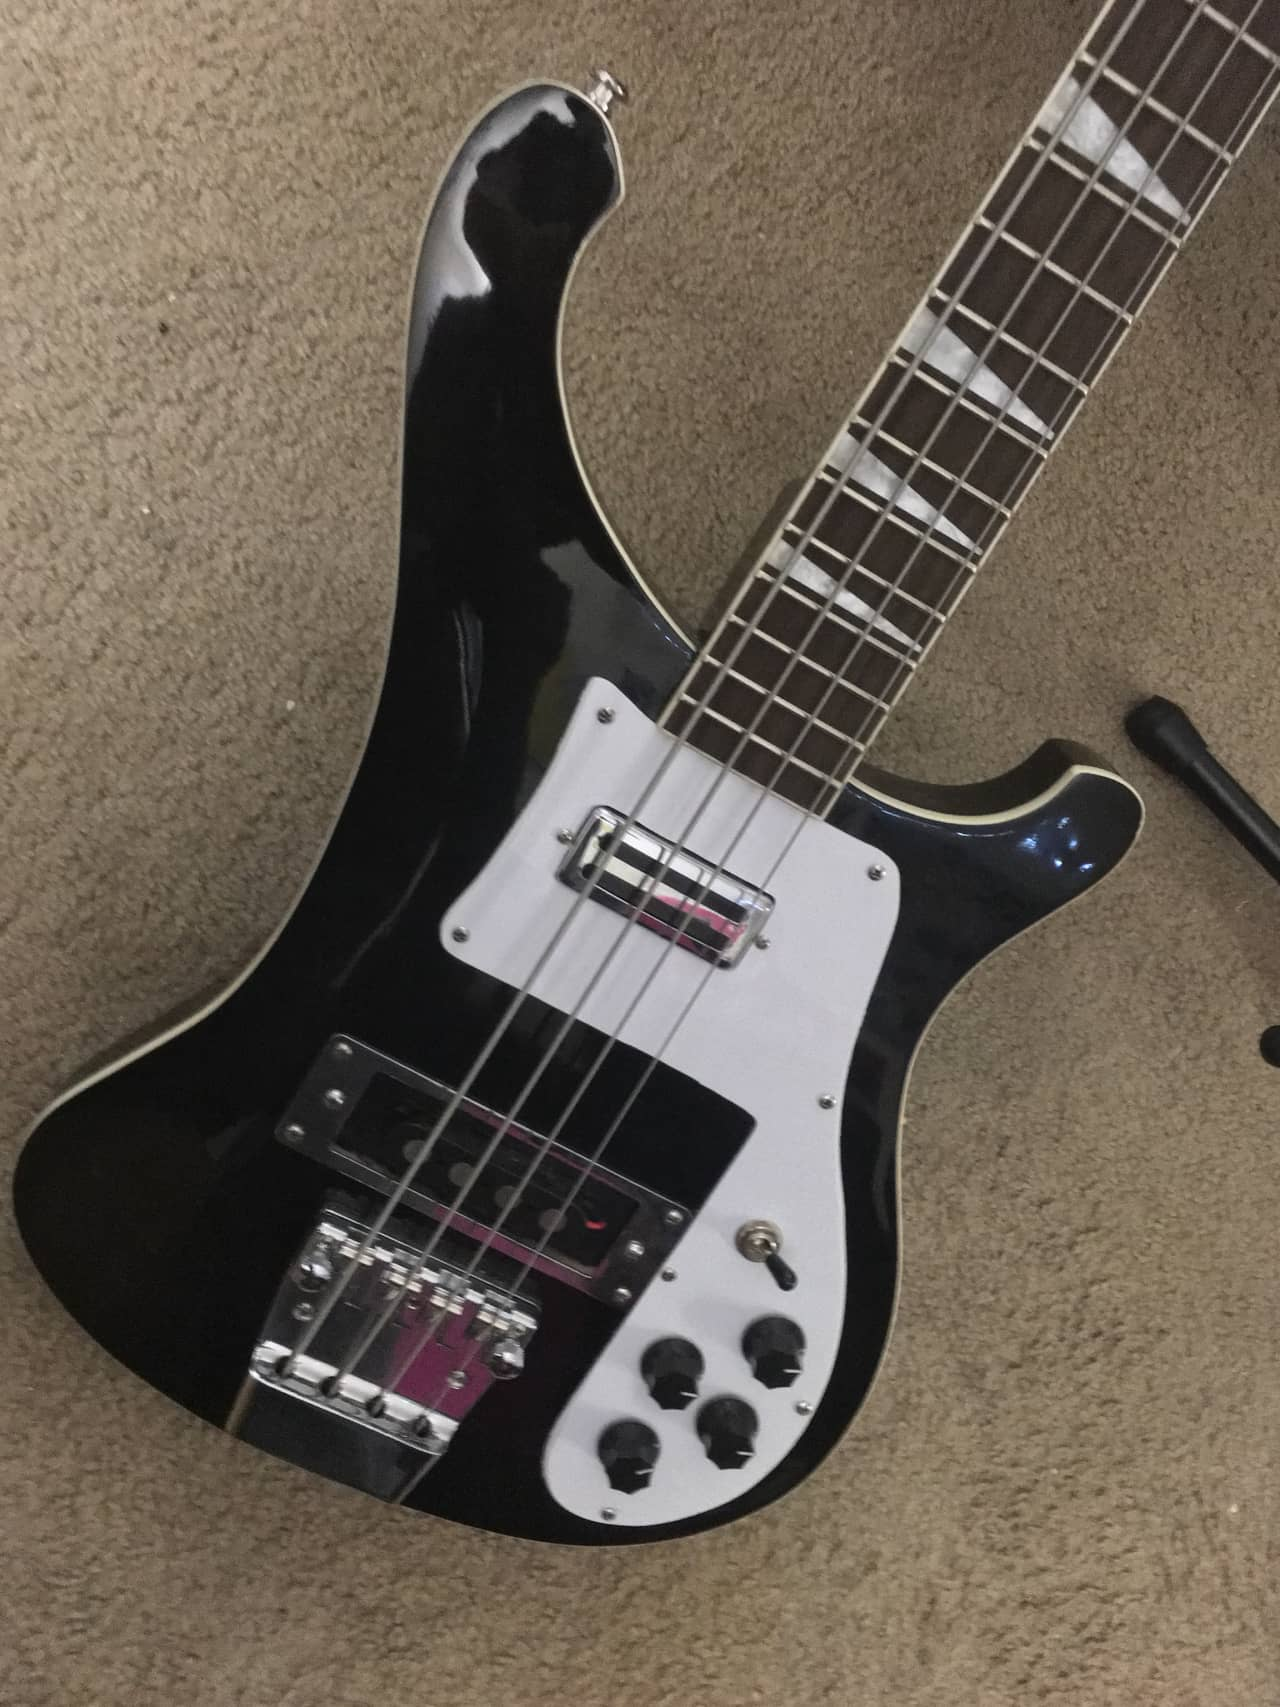 China 4 0 0 3 Bass Guitar Black | Reverb